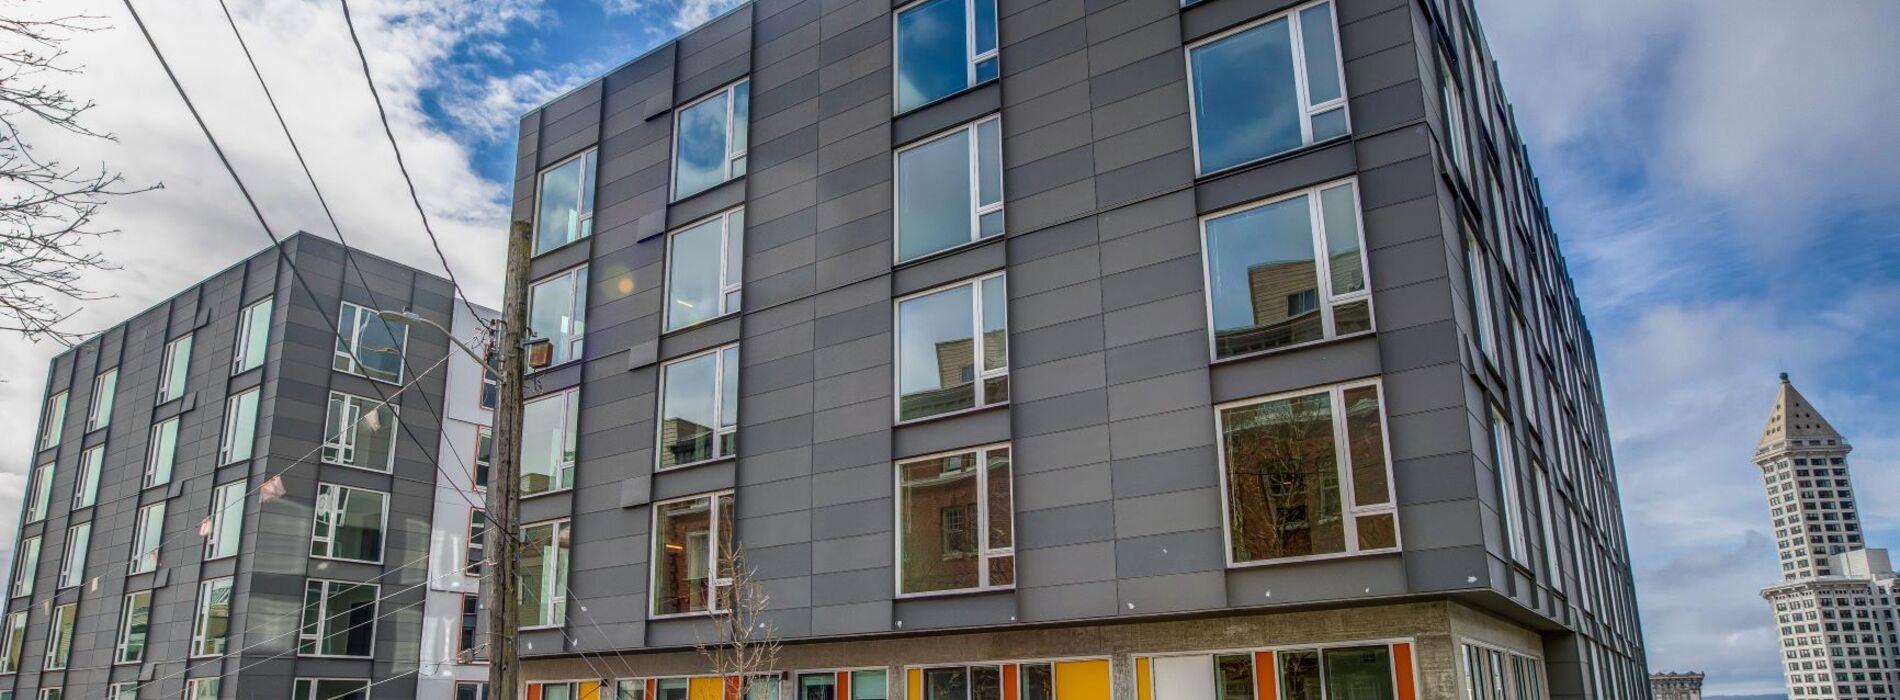 Affordable Apartments Seattle, WA | Hana